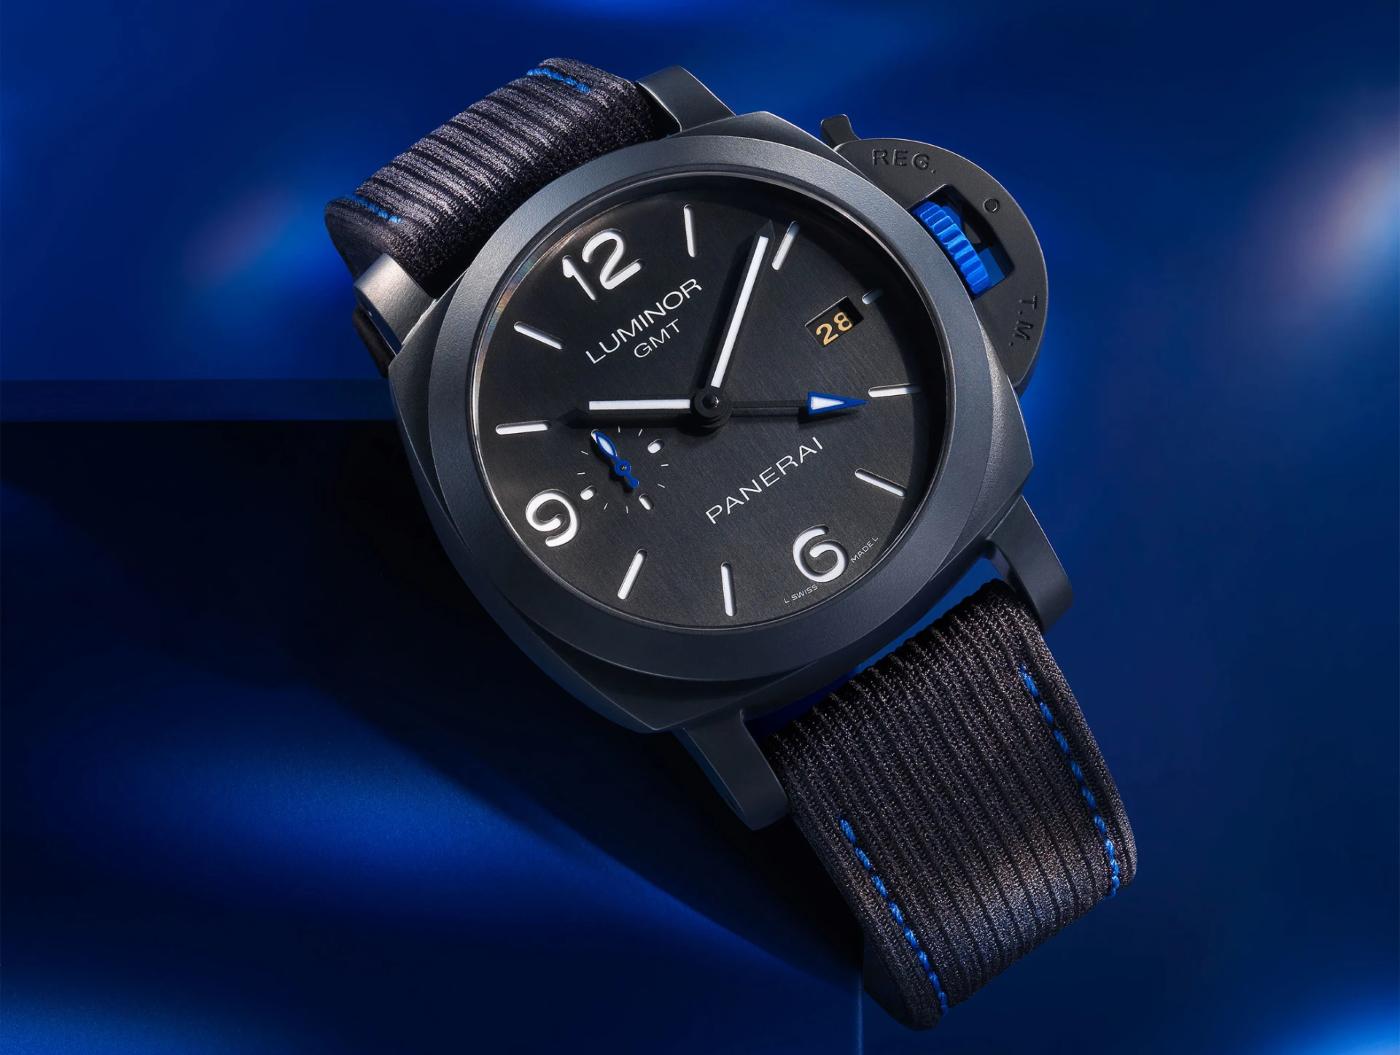 Panerai_luminor_gmt_Bucherer_blue_side-_Europa_Star_watch_magazine_2020-